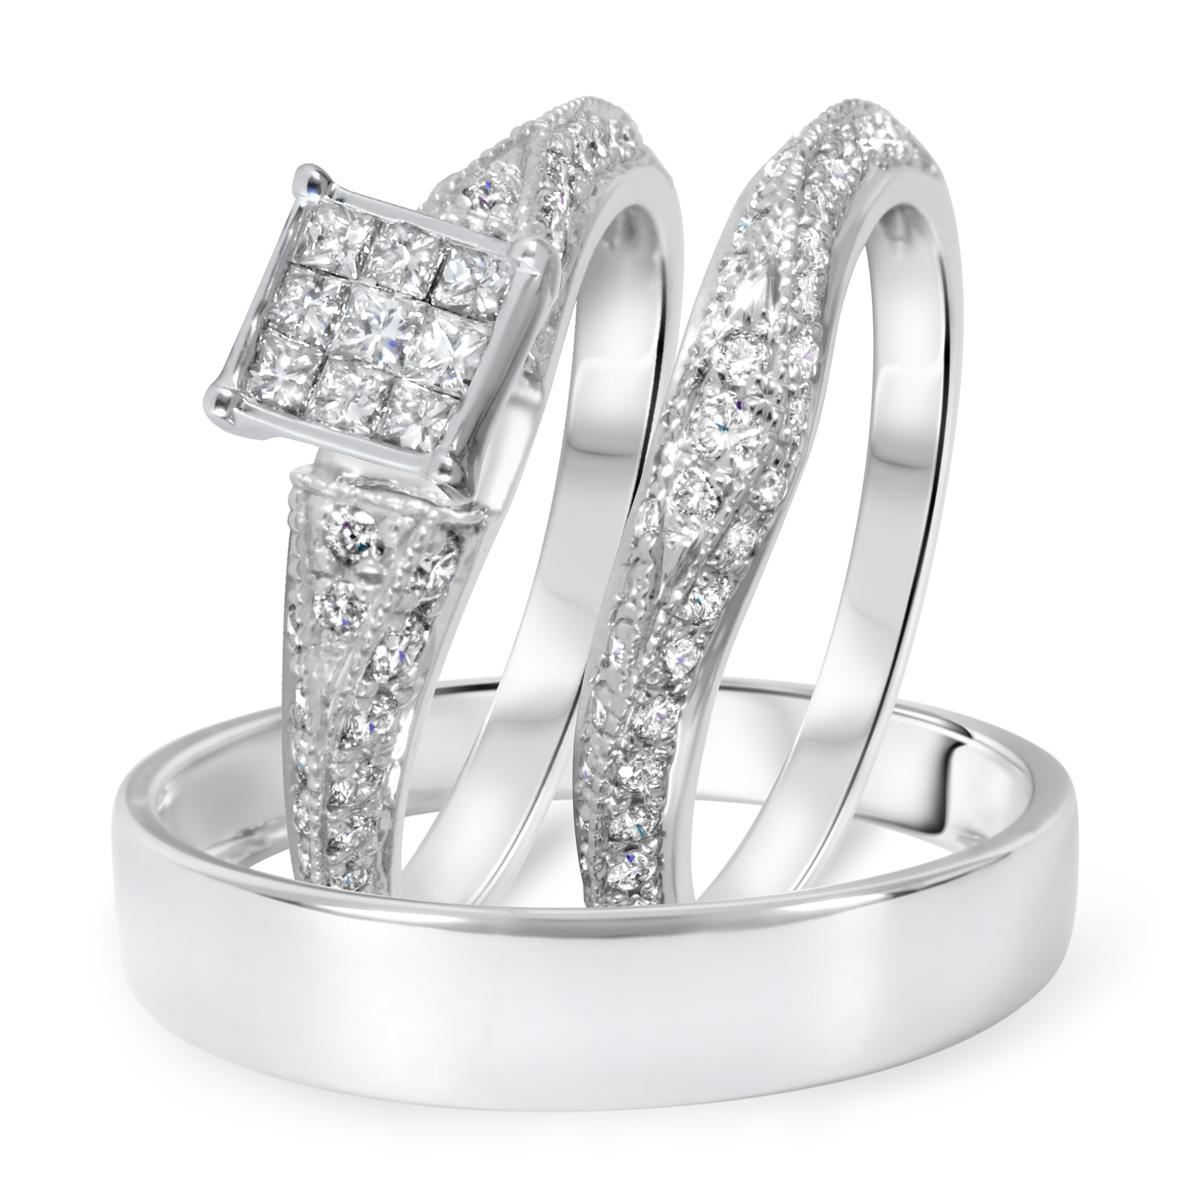 1 1/8 CT. T.W. Diamond Ladies Engagement Ring, Wedding Band, Men's Wedding Band